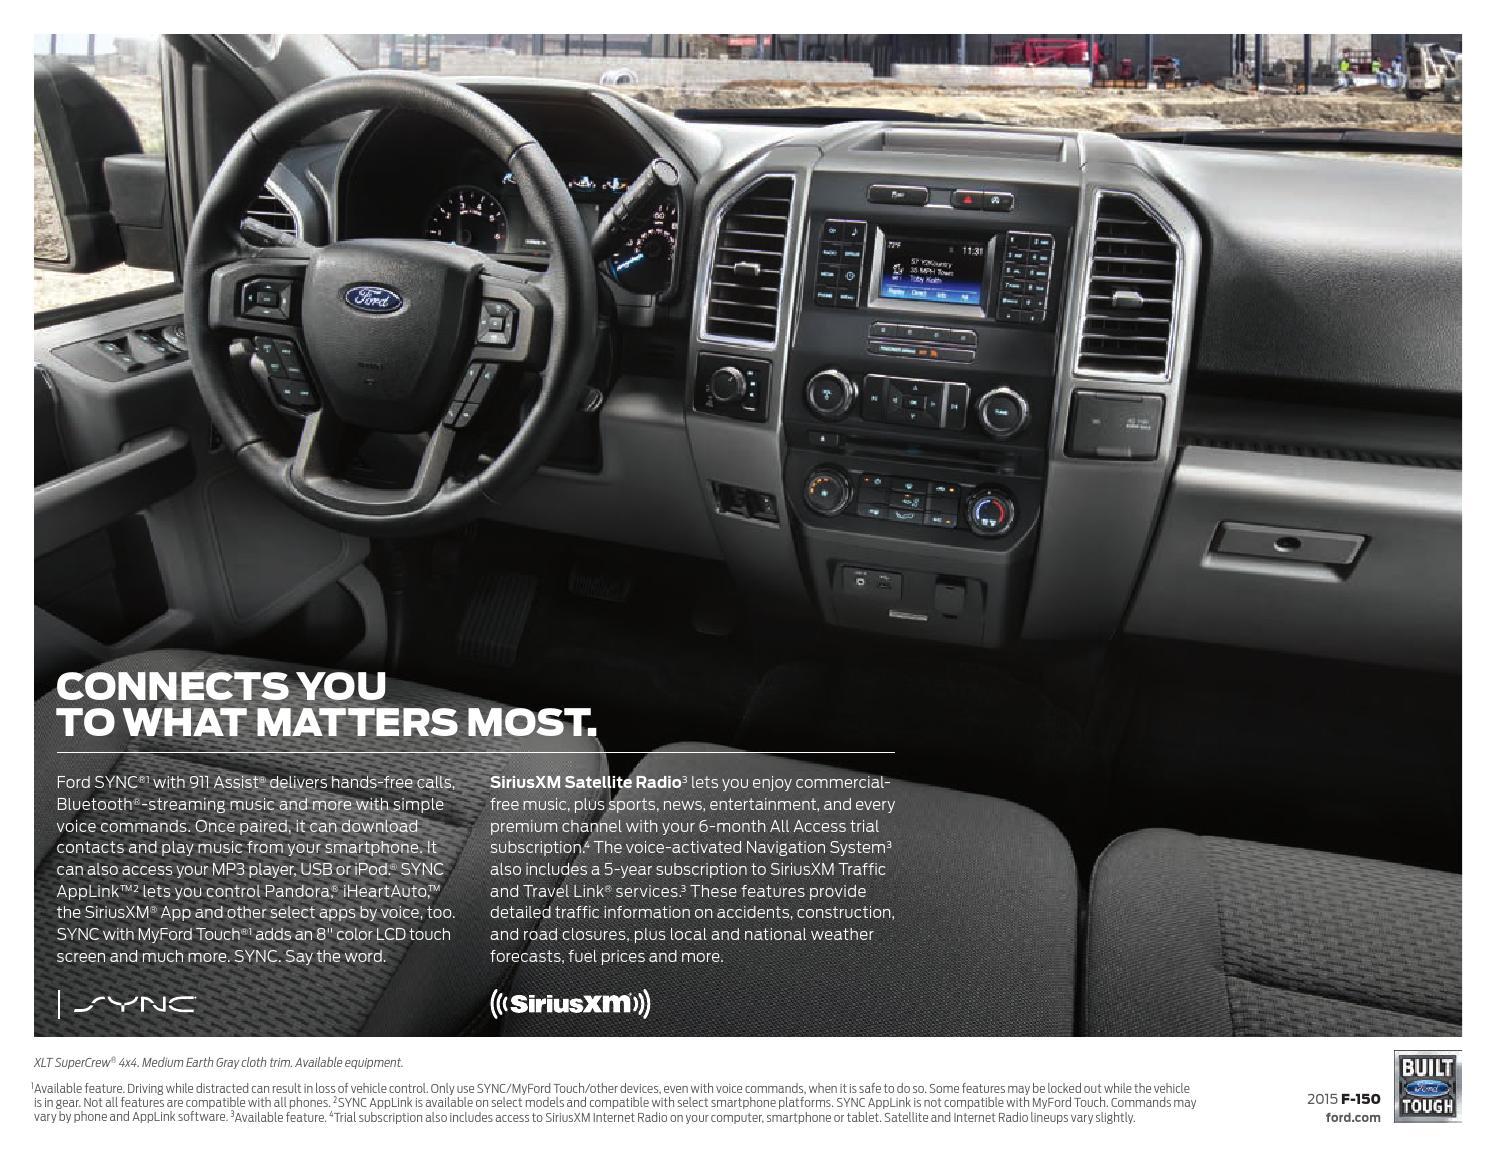 2015 Ford F-150 Factory Brochure - Bob Smith Ford by Bob